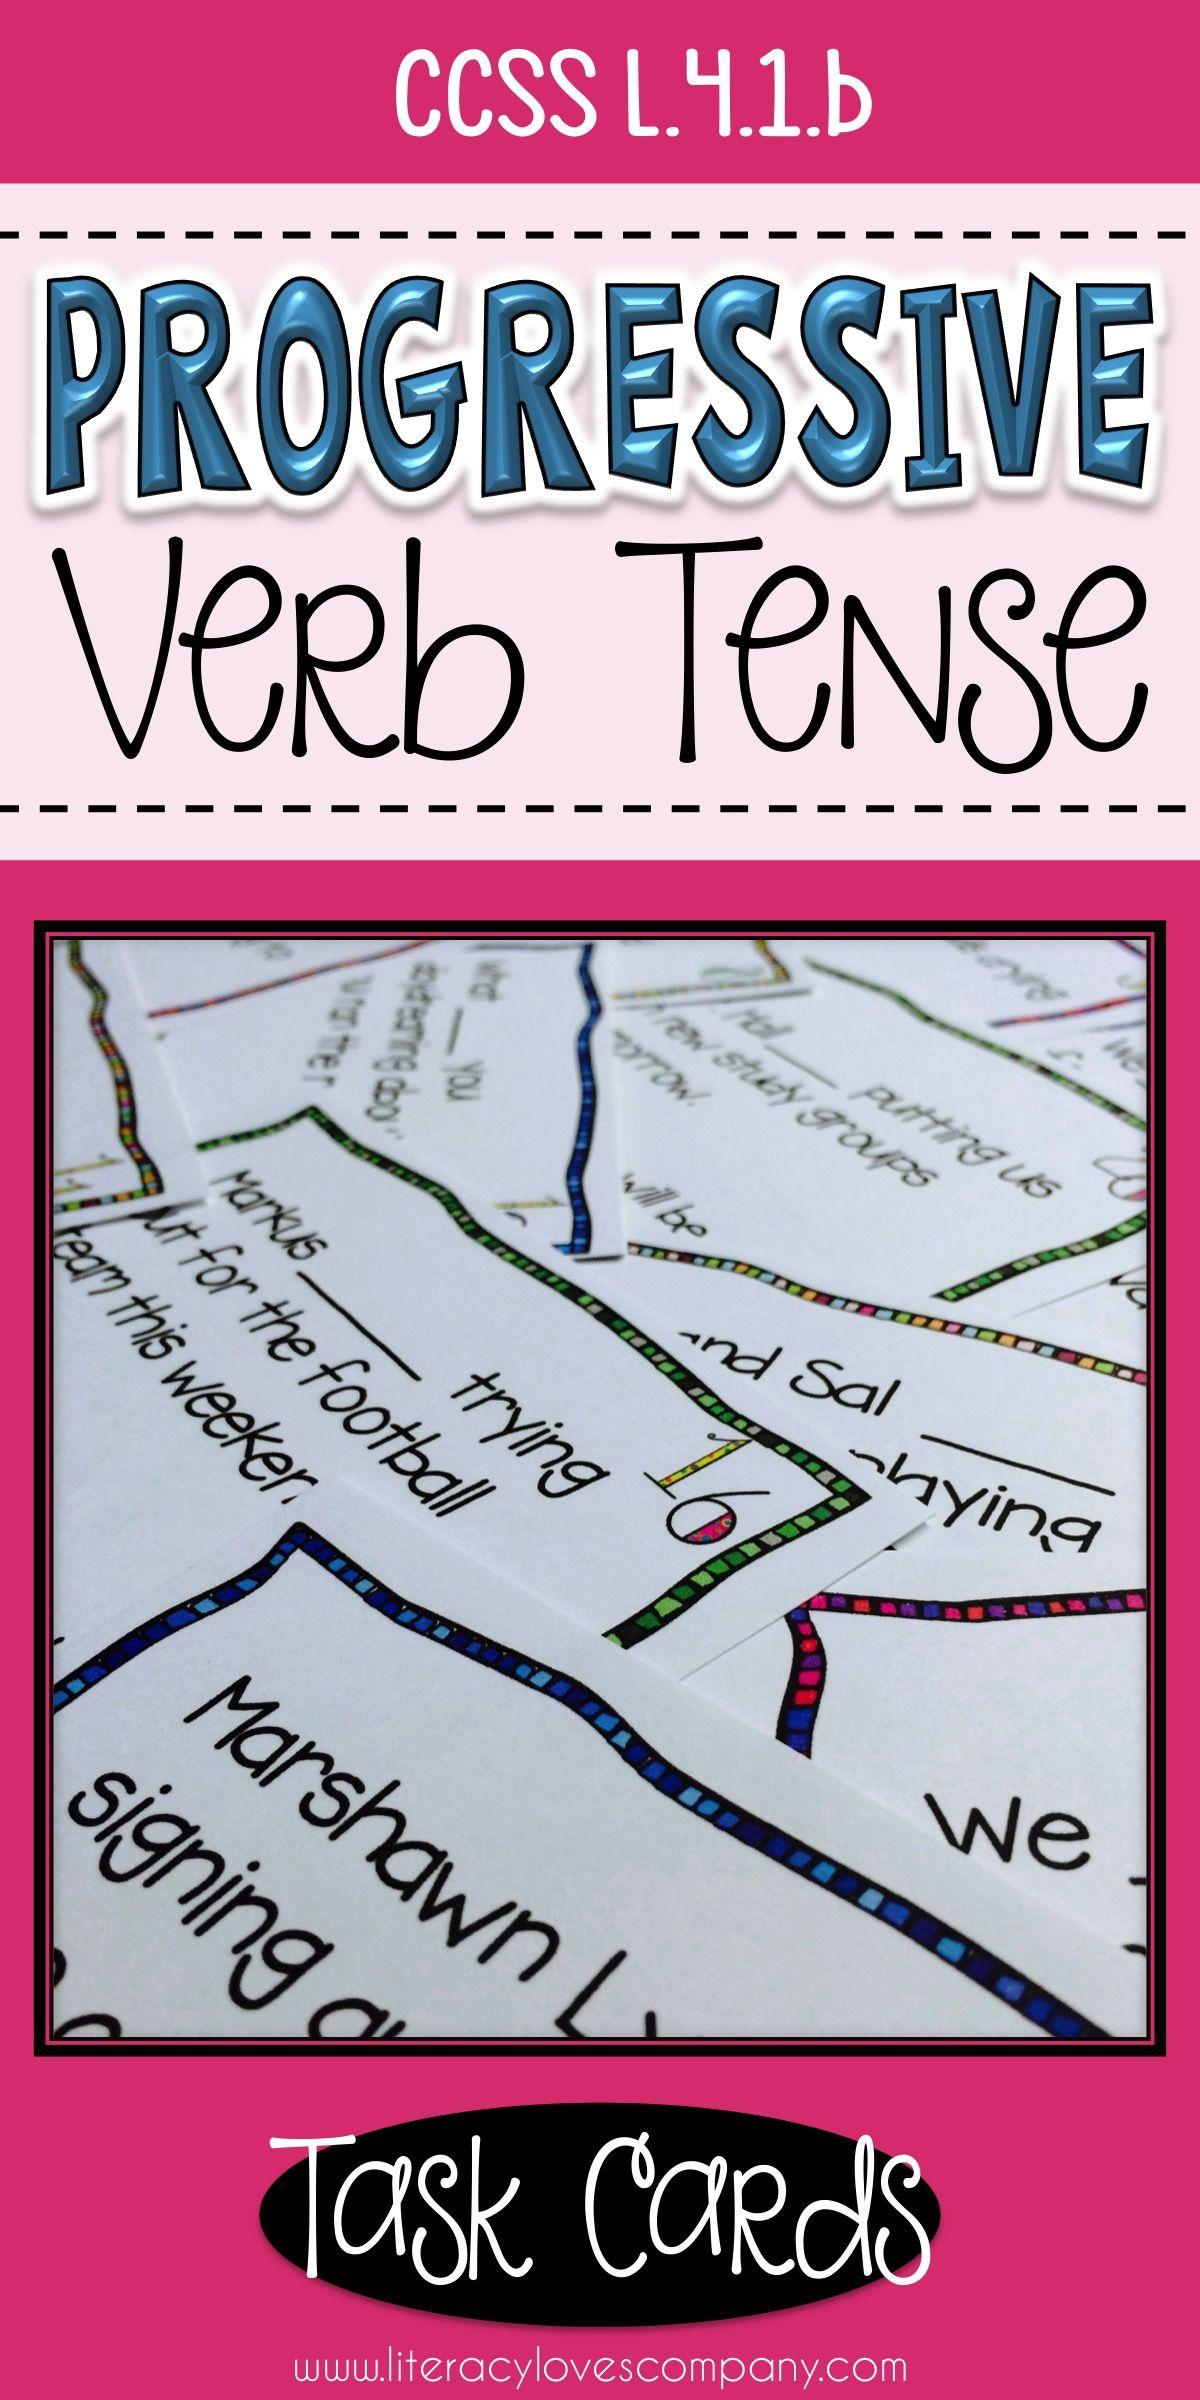 Progressive Verb Tense Task Cards Ccss L 4 1 B